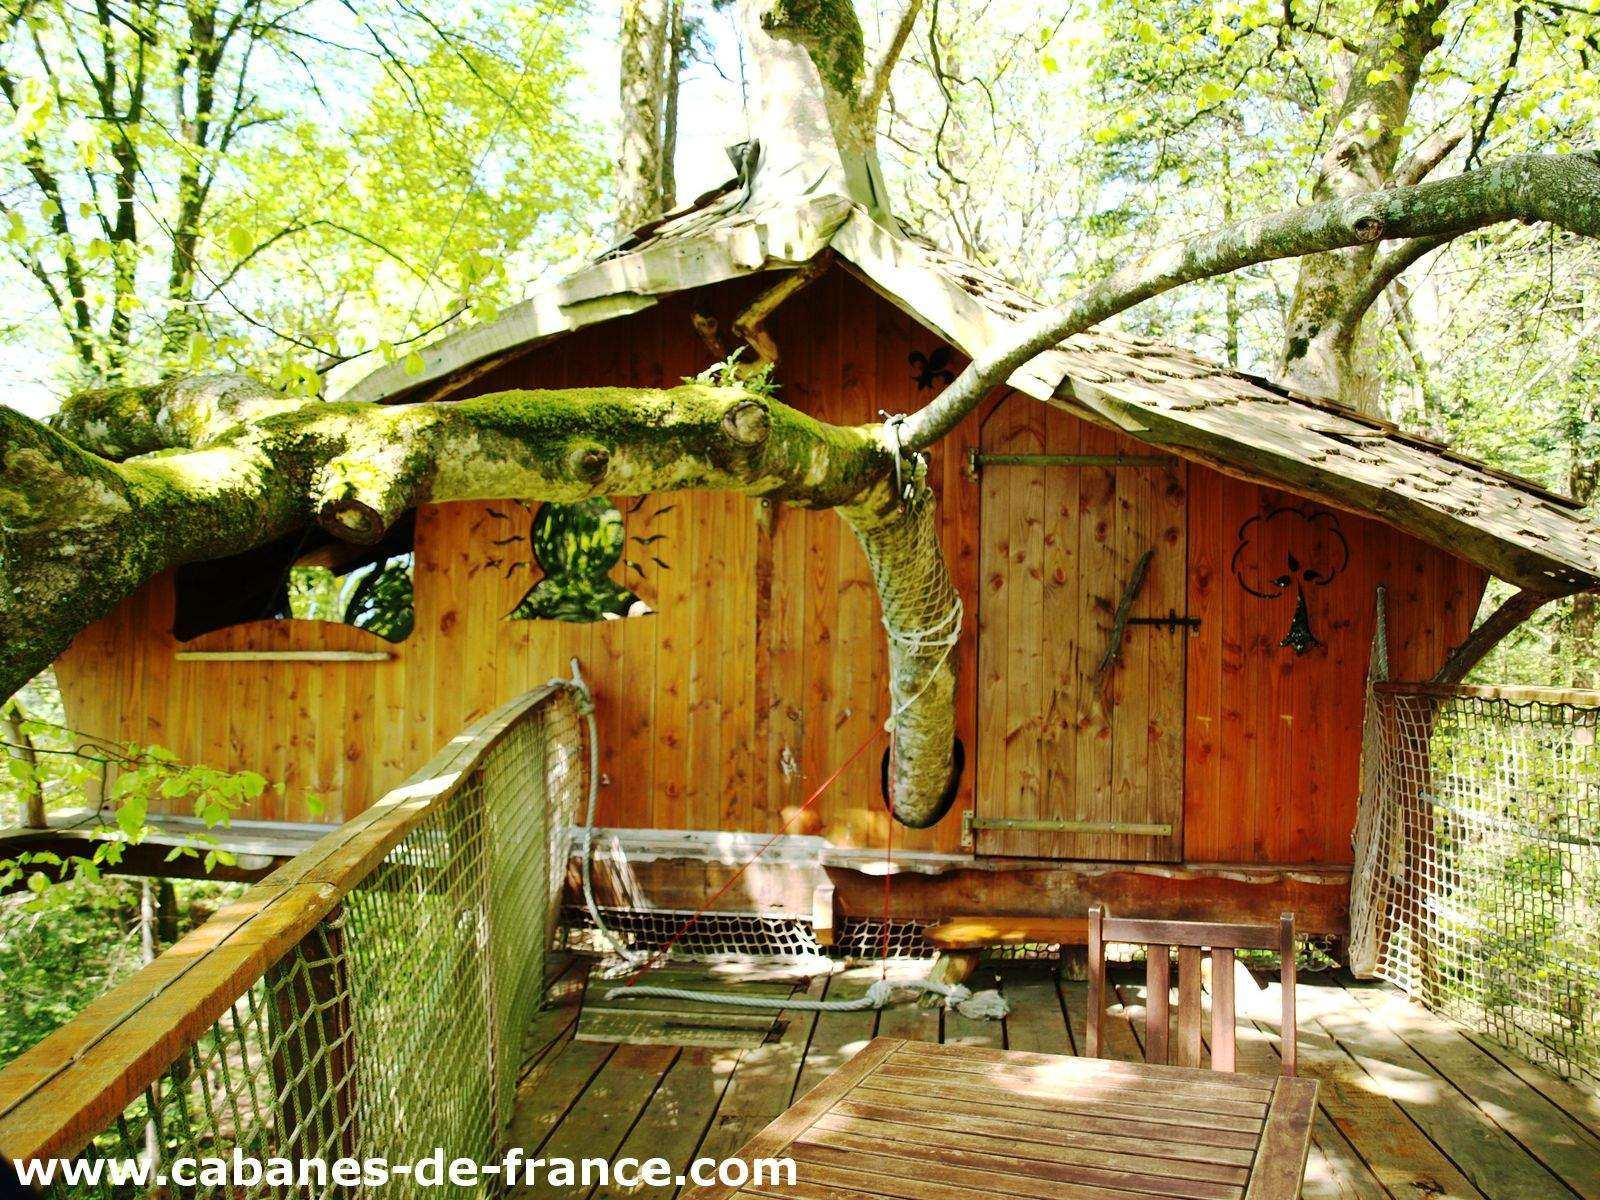 cabane jonquille cabanes de kermenguy cabane dans les arbres en bretagne cabanes de france. Black Bedroom Furniture Sets. Home Design Ideas